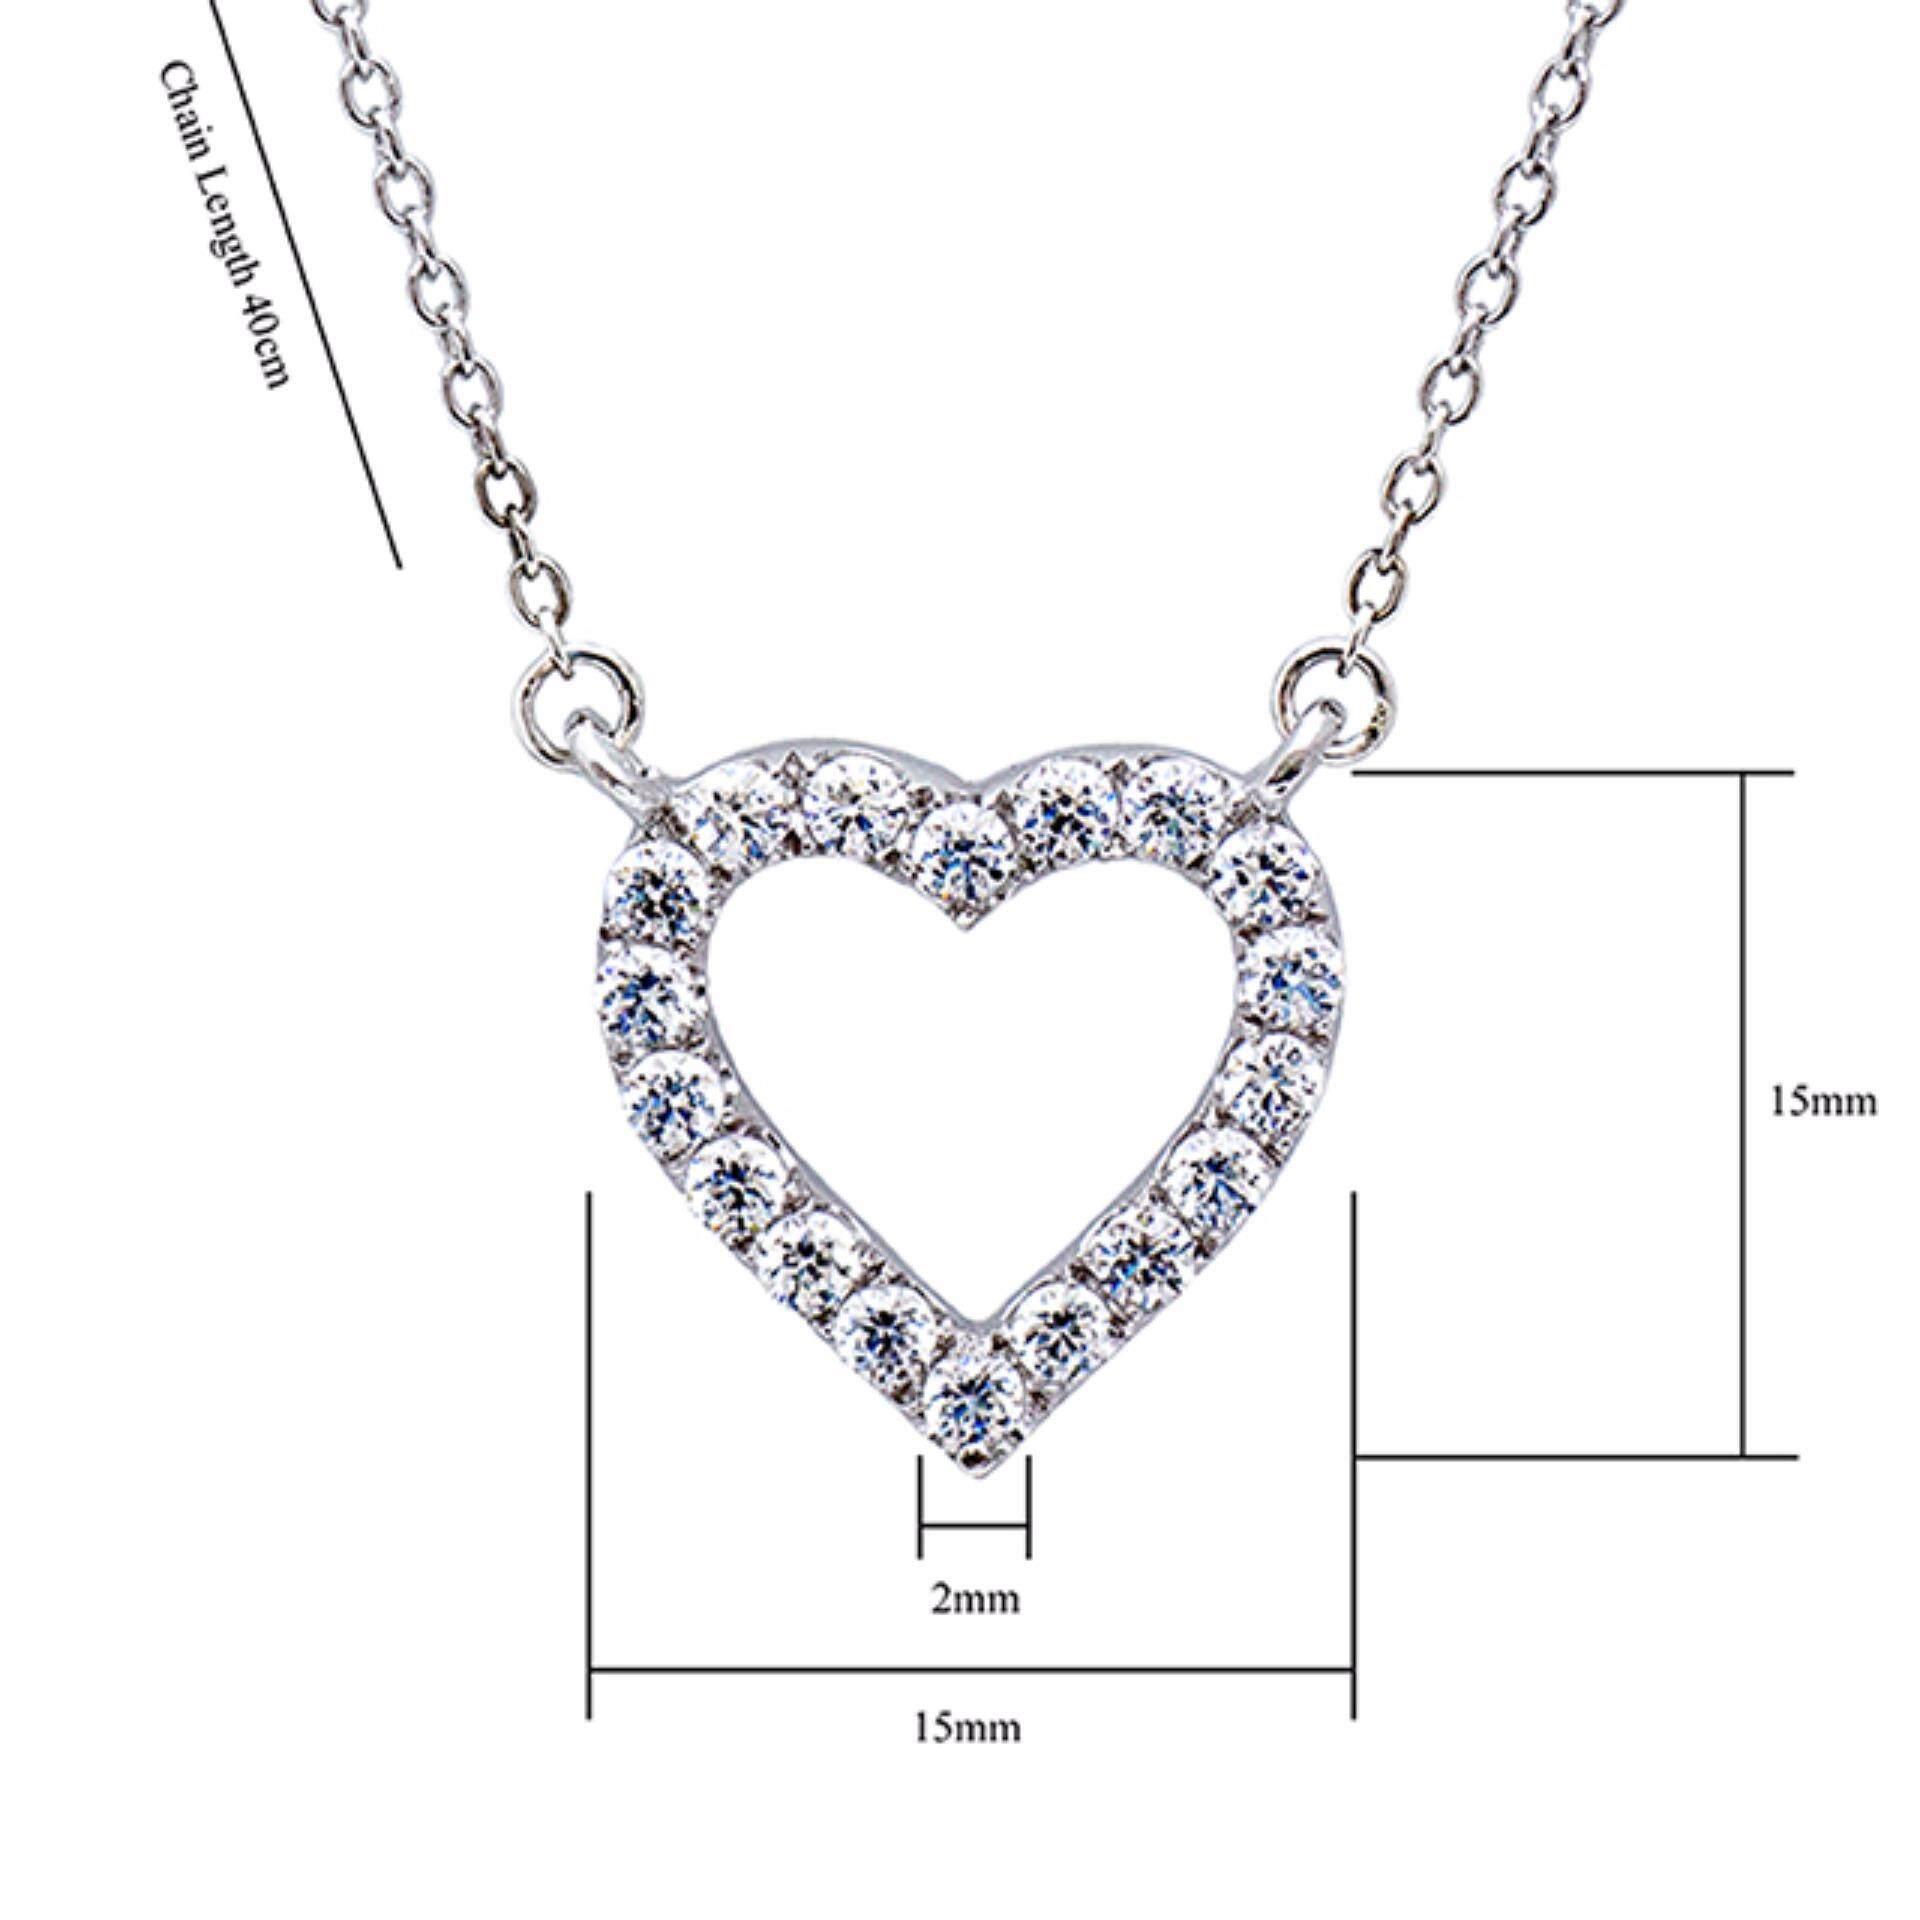 Kelvin Gems Premium My Heart Gift Set m/w SWAROVSKI Zirconia